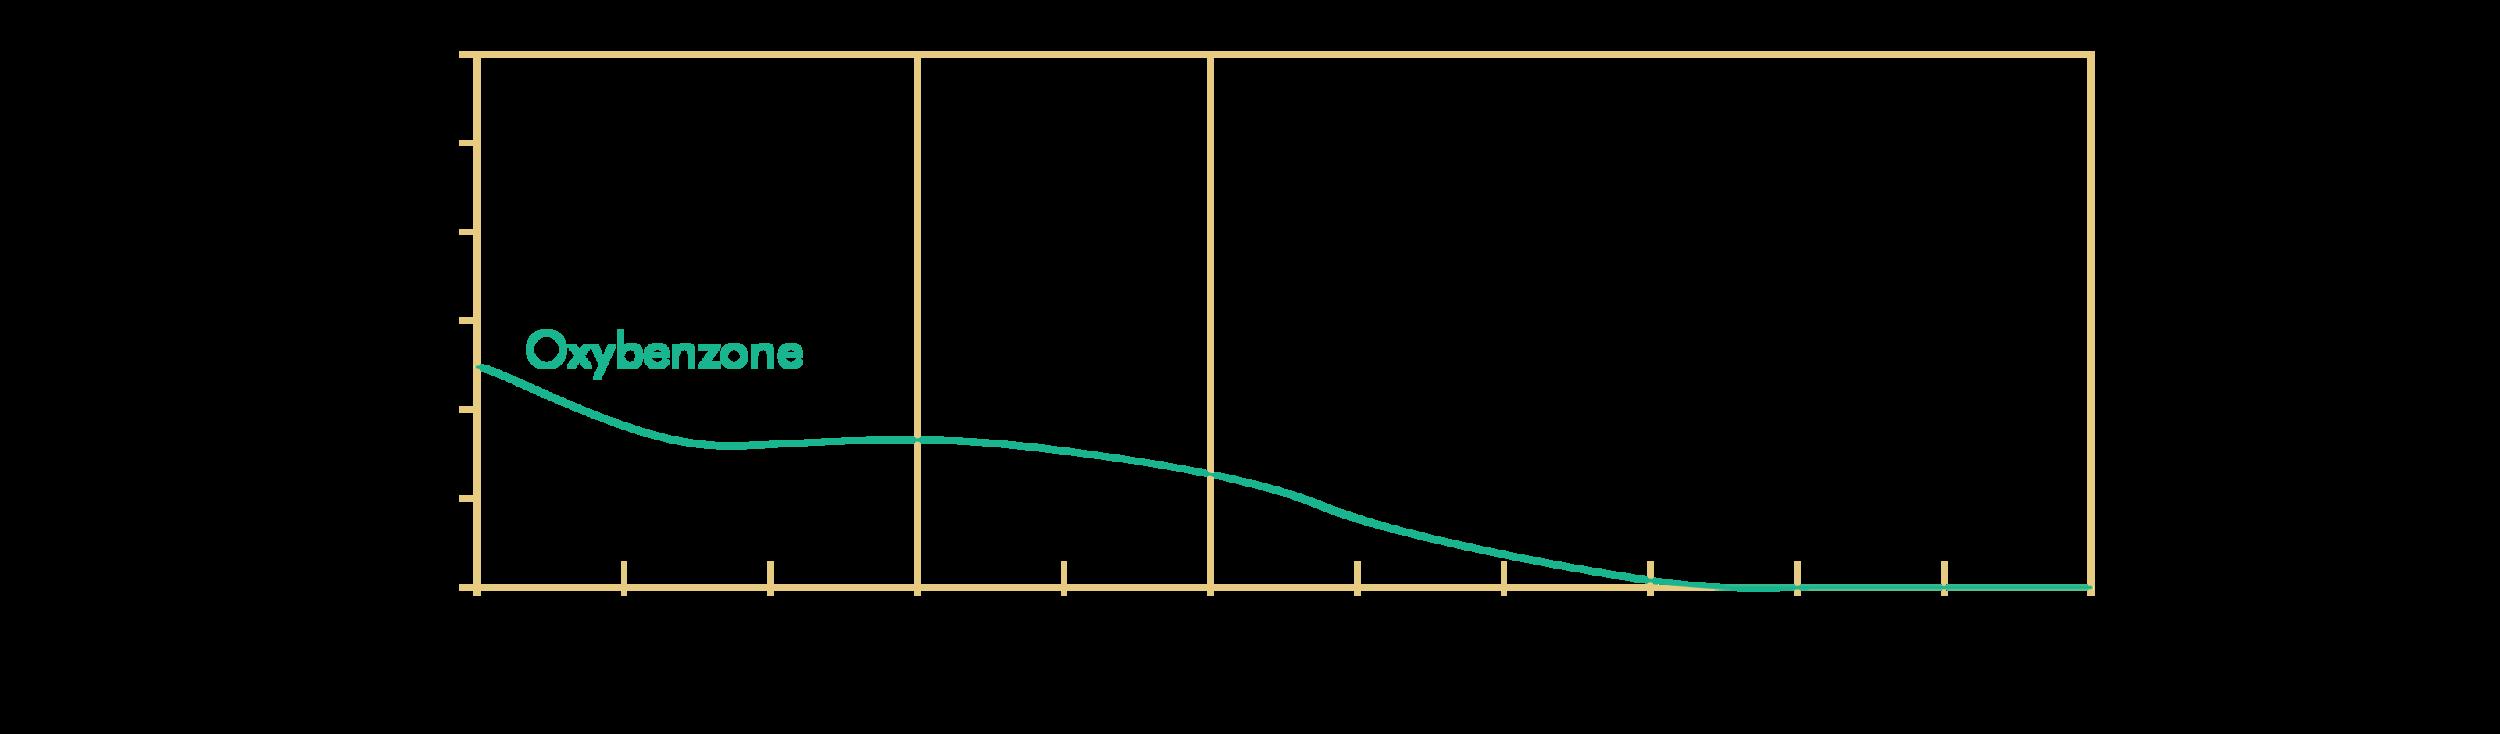 Oxybenzone; INCI: Benzophenone-3